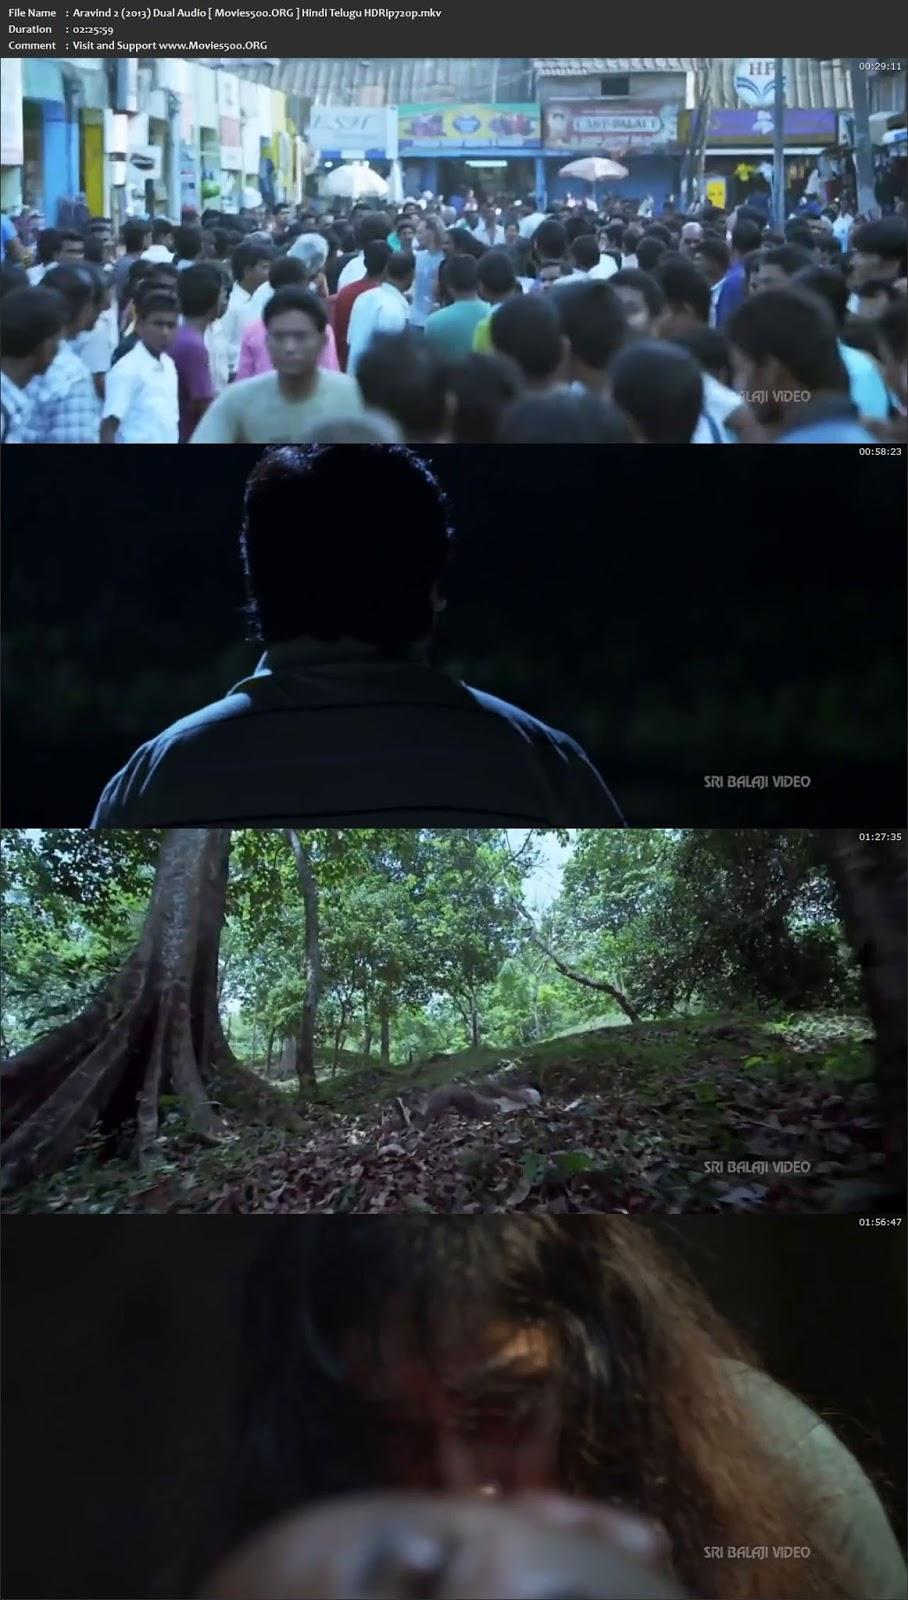 Aravind 2 (2013) Hindi Dubbed 490MB Download HDRip 480p